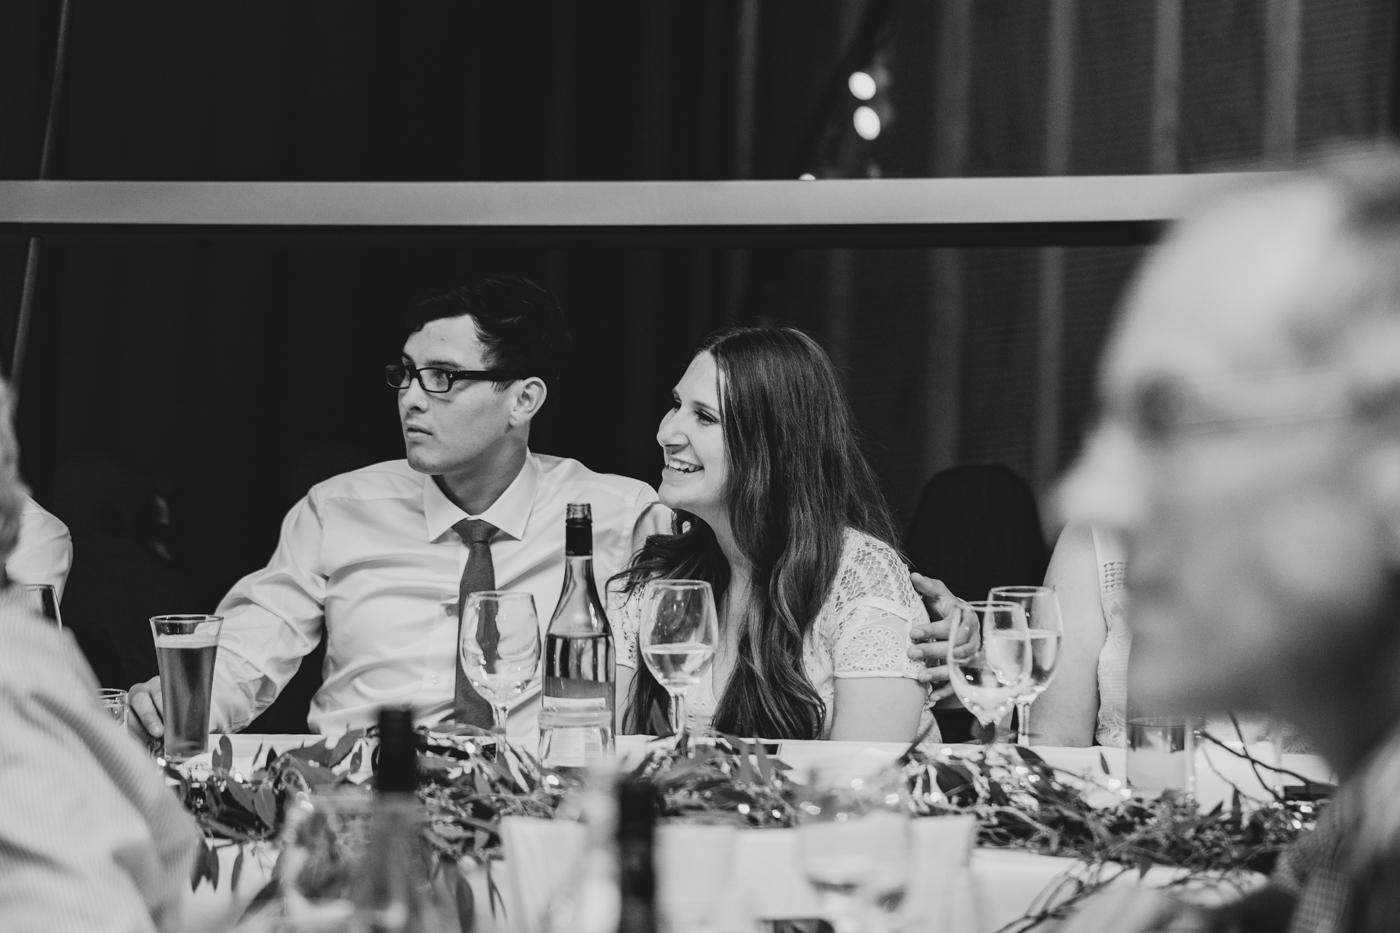 Ariana & Tim - Dunedin, New Zealand Wedding - Destination Wedding - Samantha Heather Photography-265.jpg